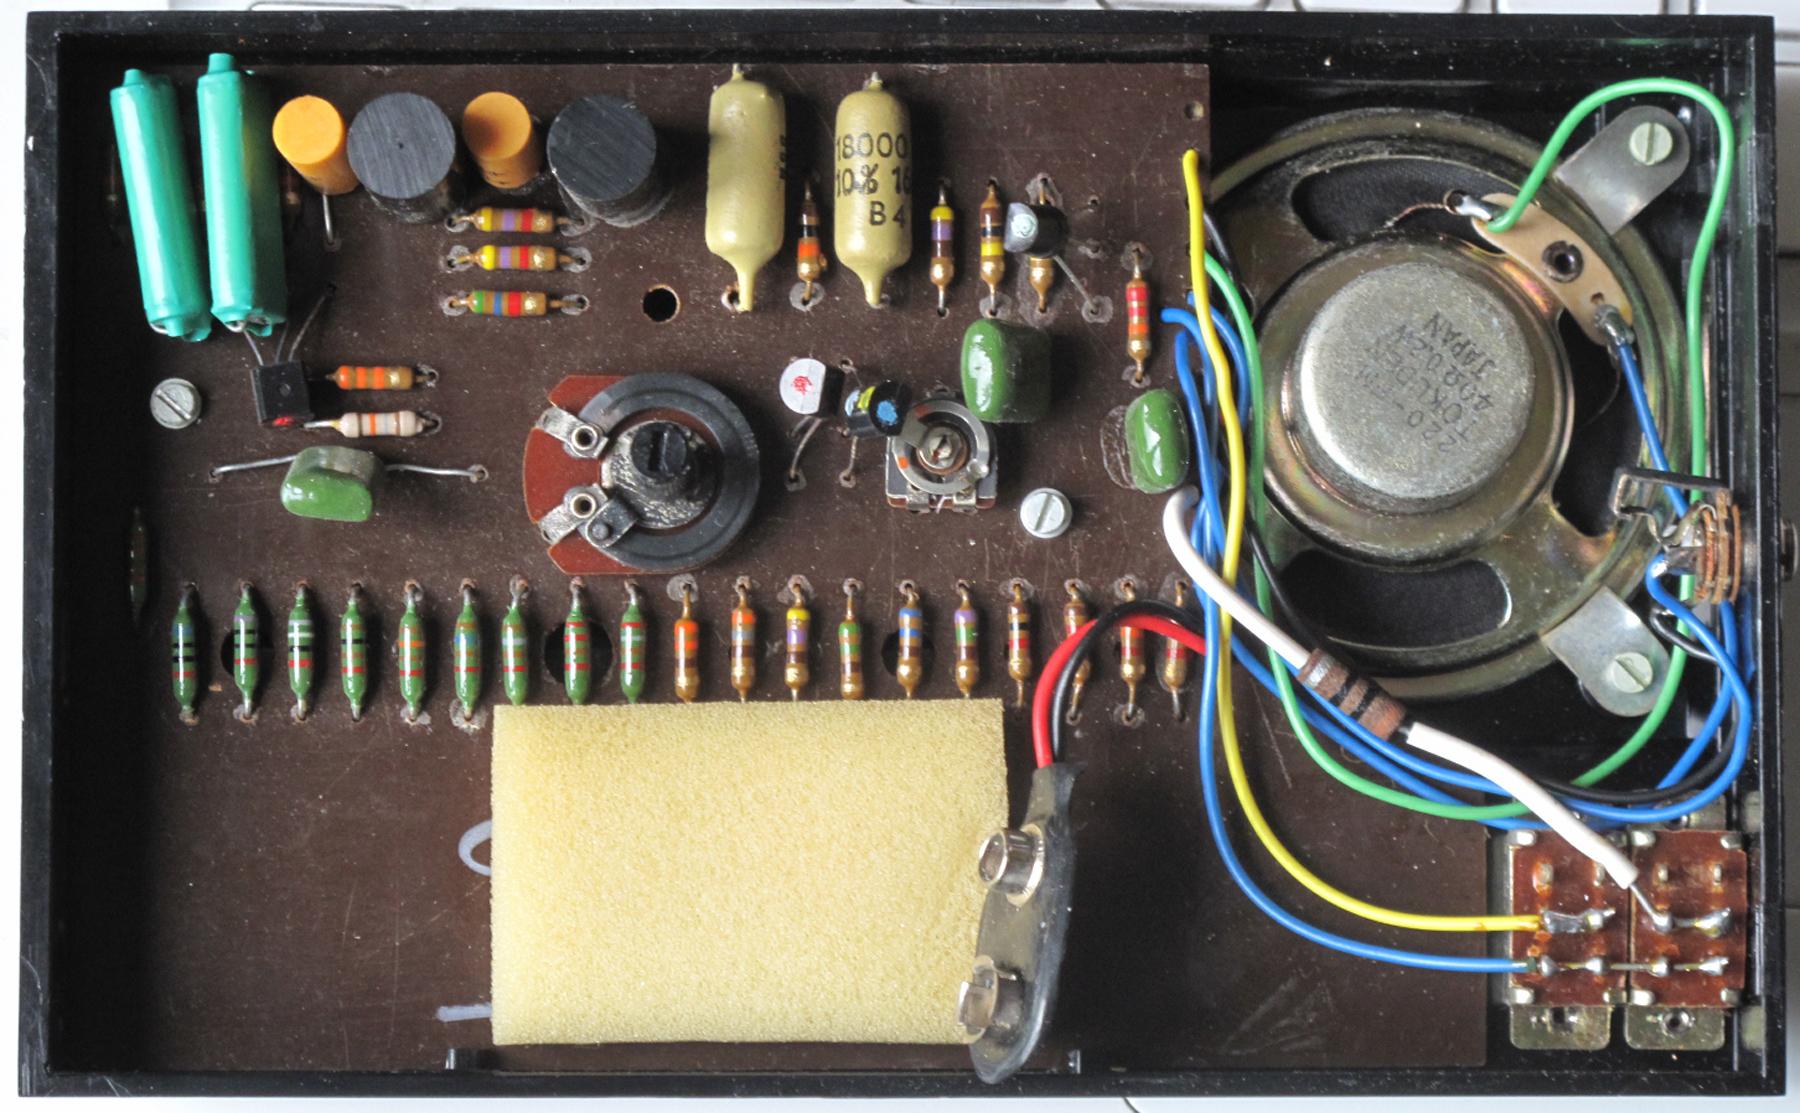 2012 Music Electronics Page 2 Computer Integrated Circuit Diagram Filtercircuit Basiccircuit Original Inside Img 1060